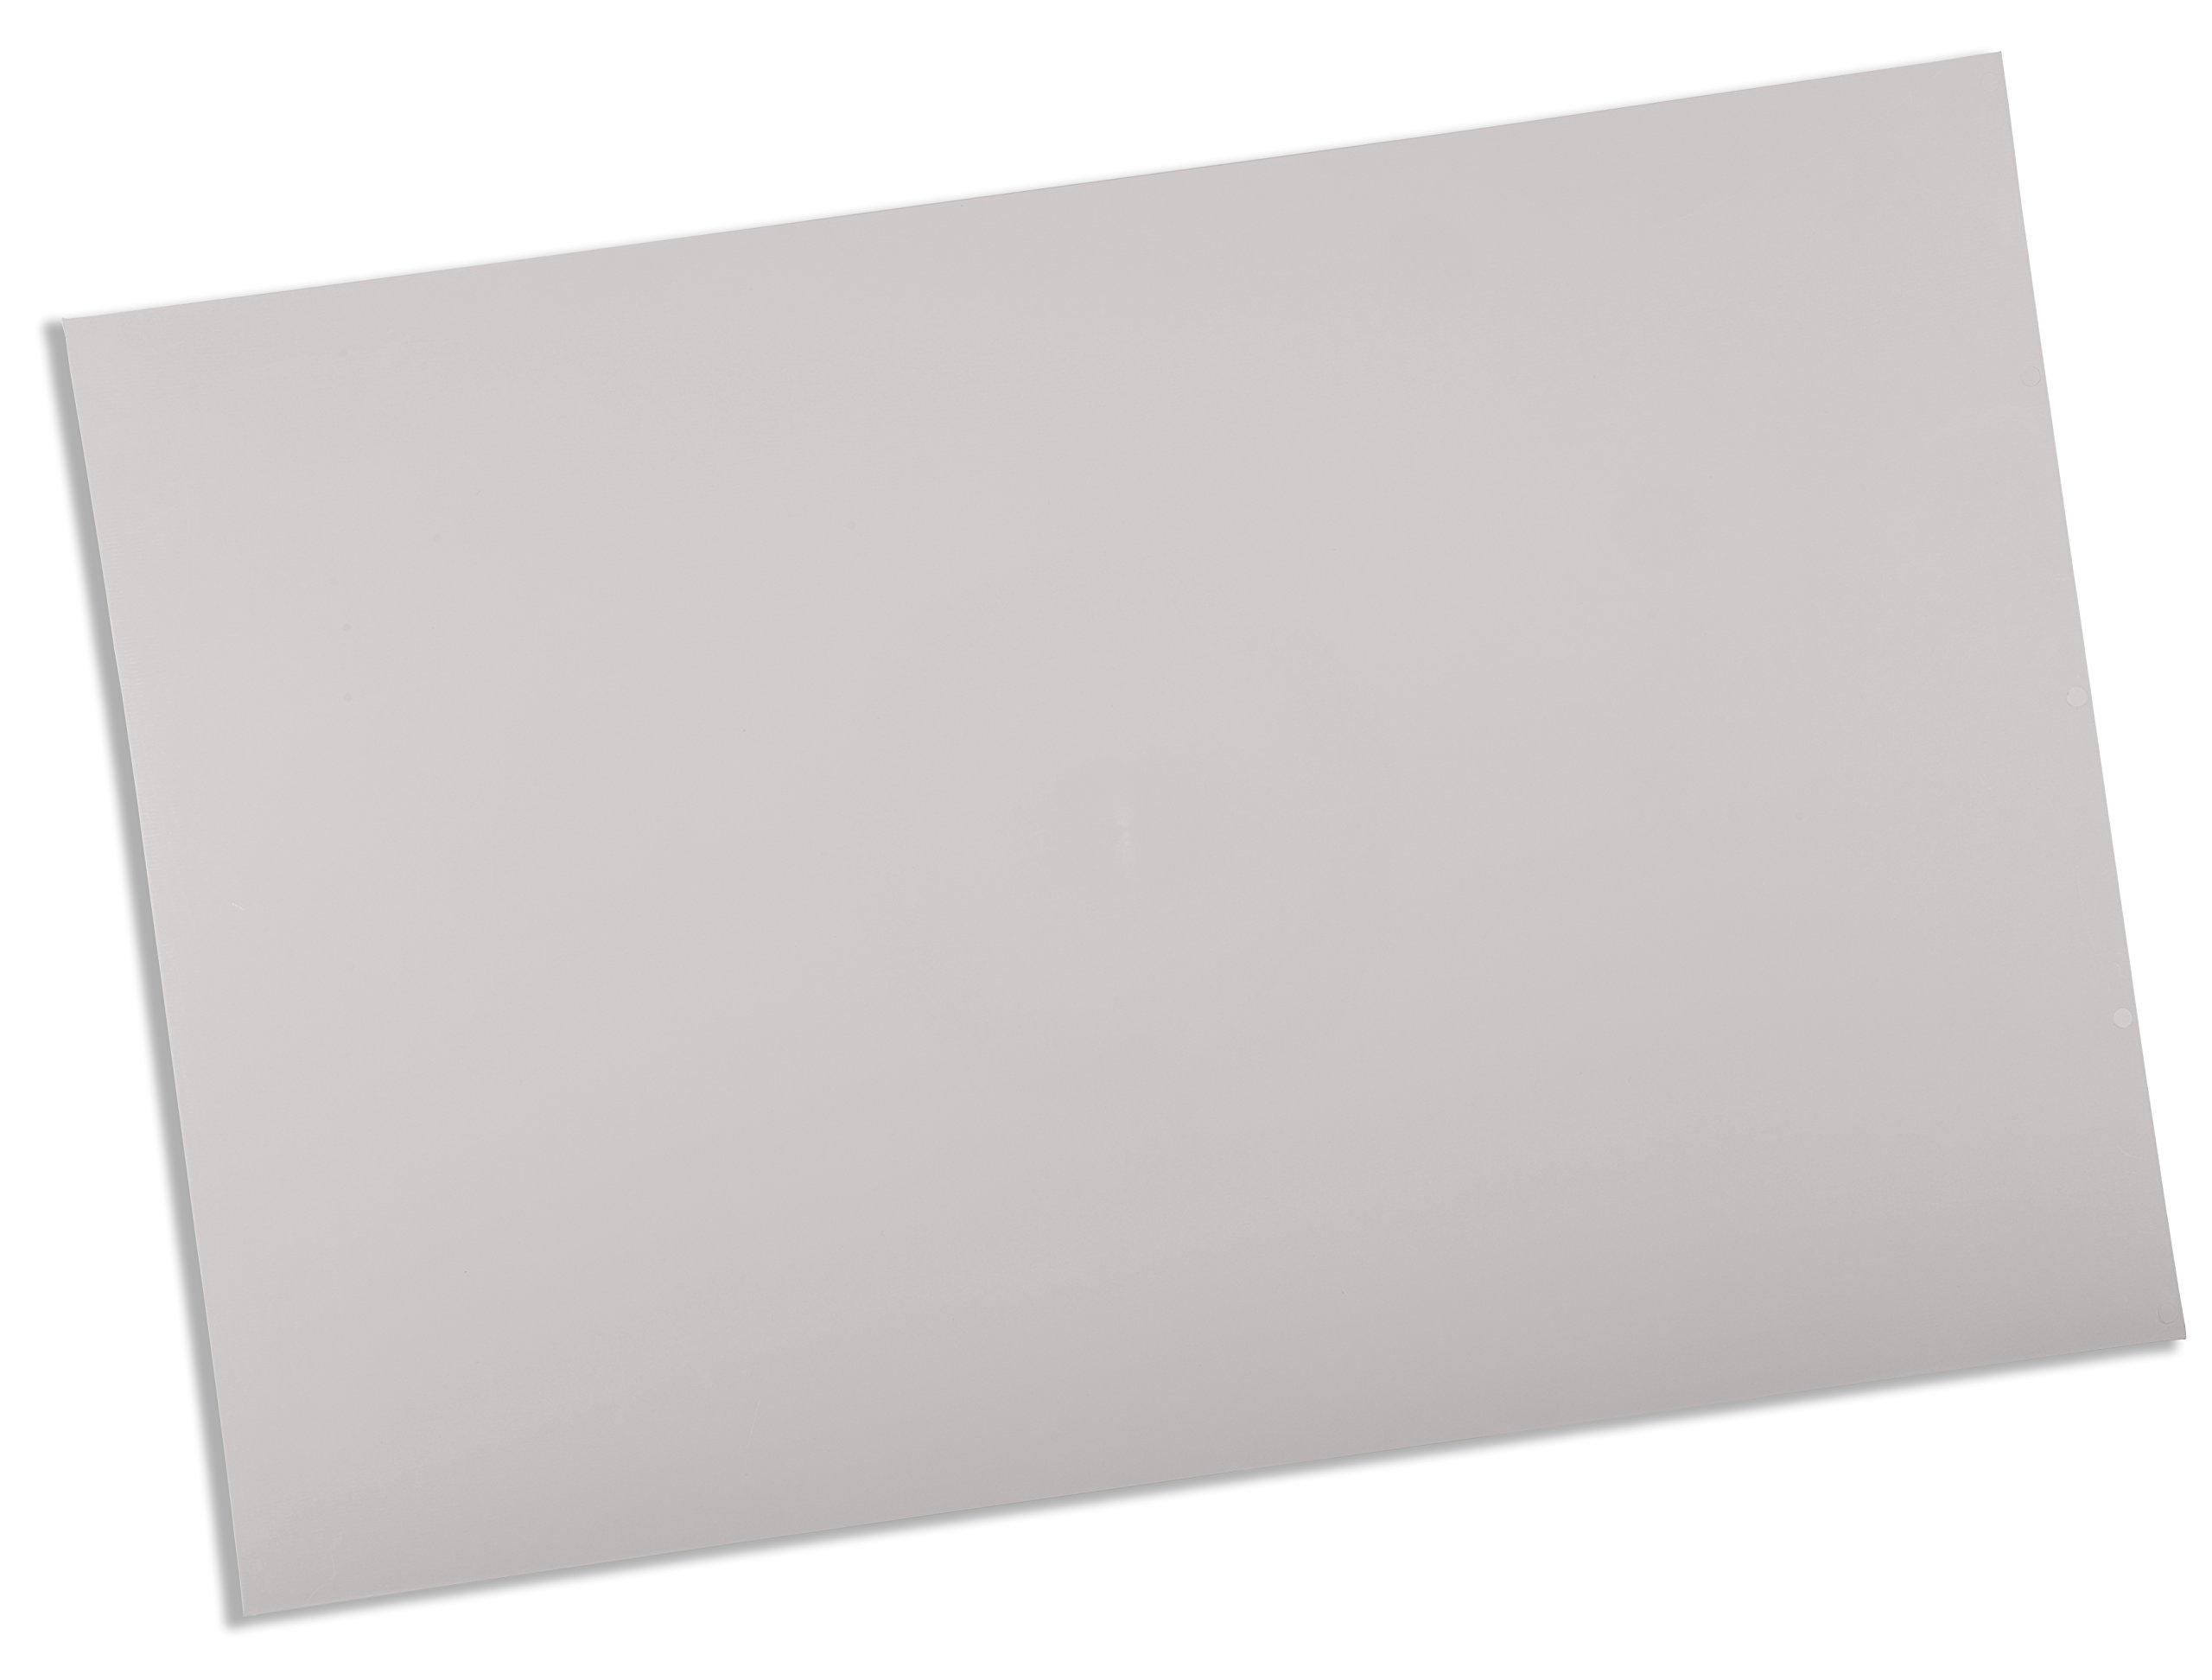 Rolyan Splinting Material Sheet, Ezeform, White, 3/32'' x 18'' x 24'', Solid, 4 Sheets